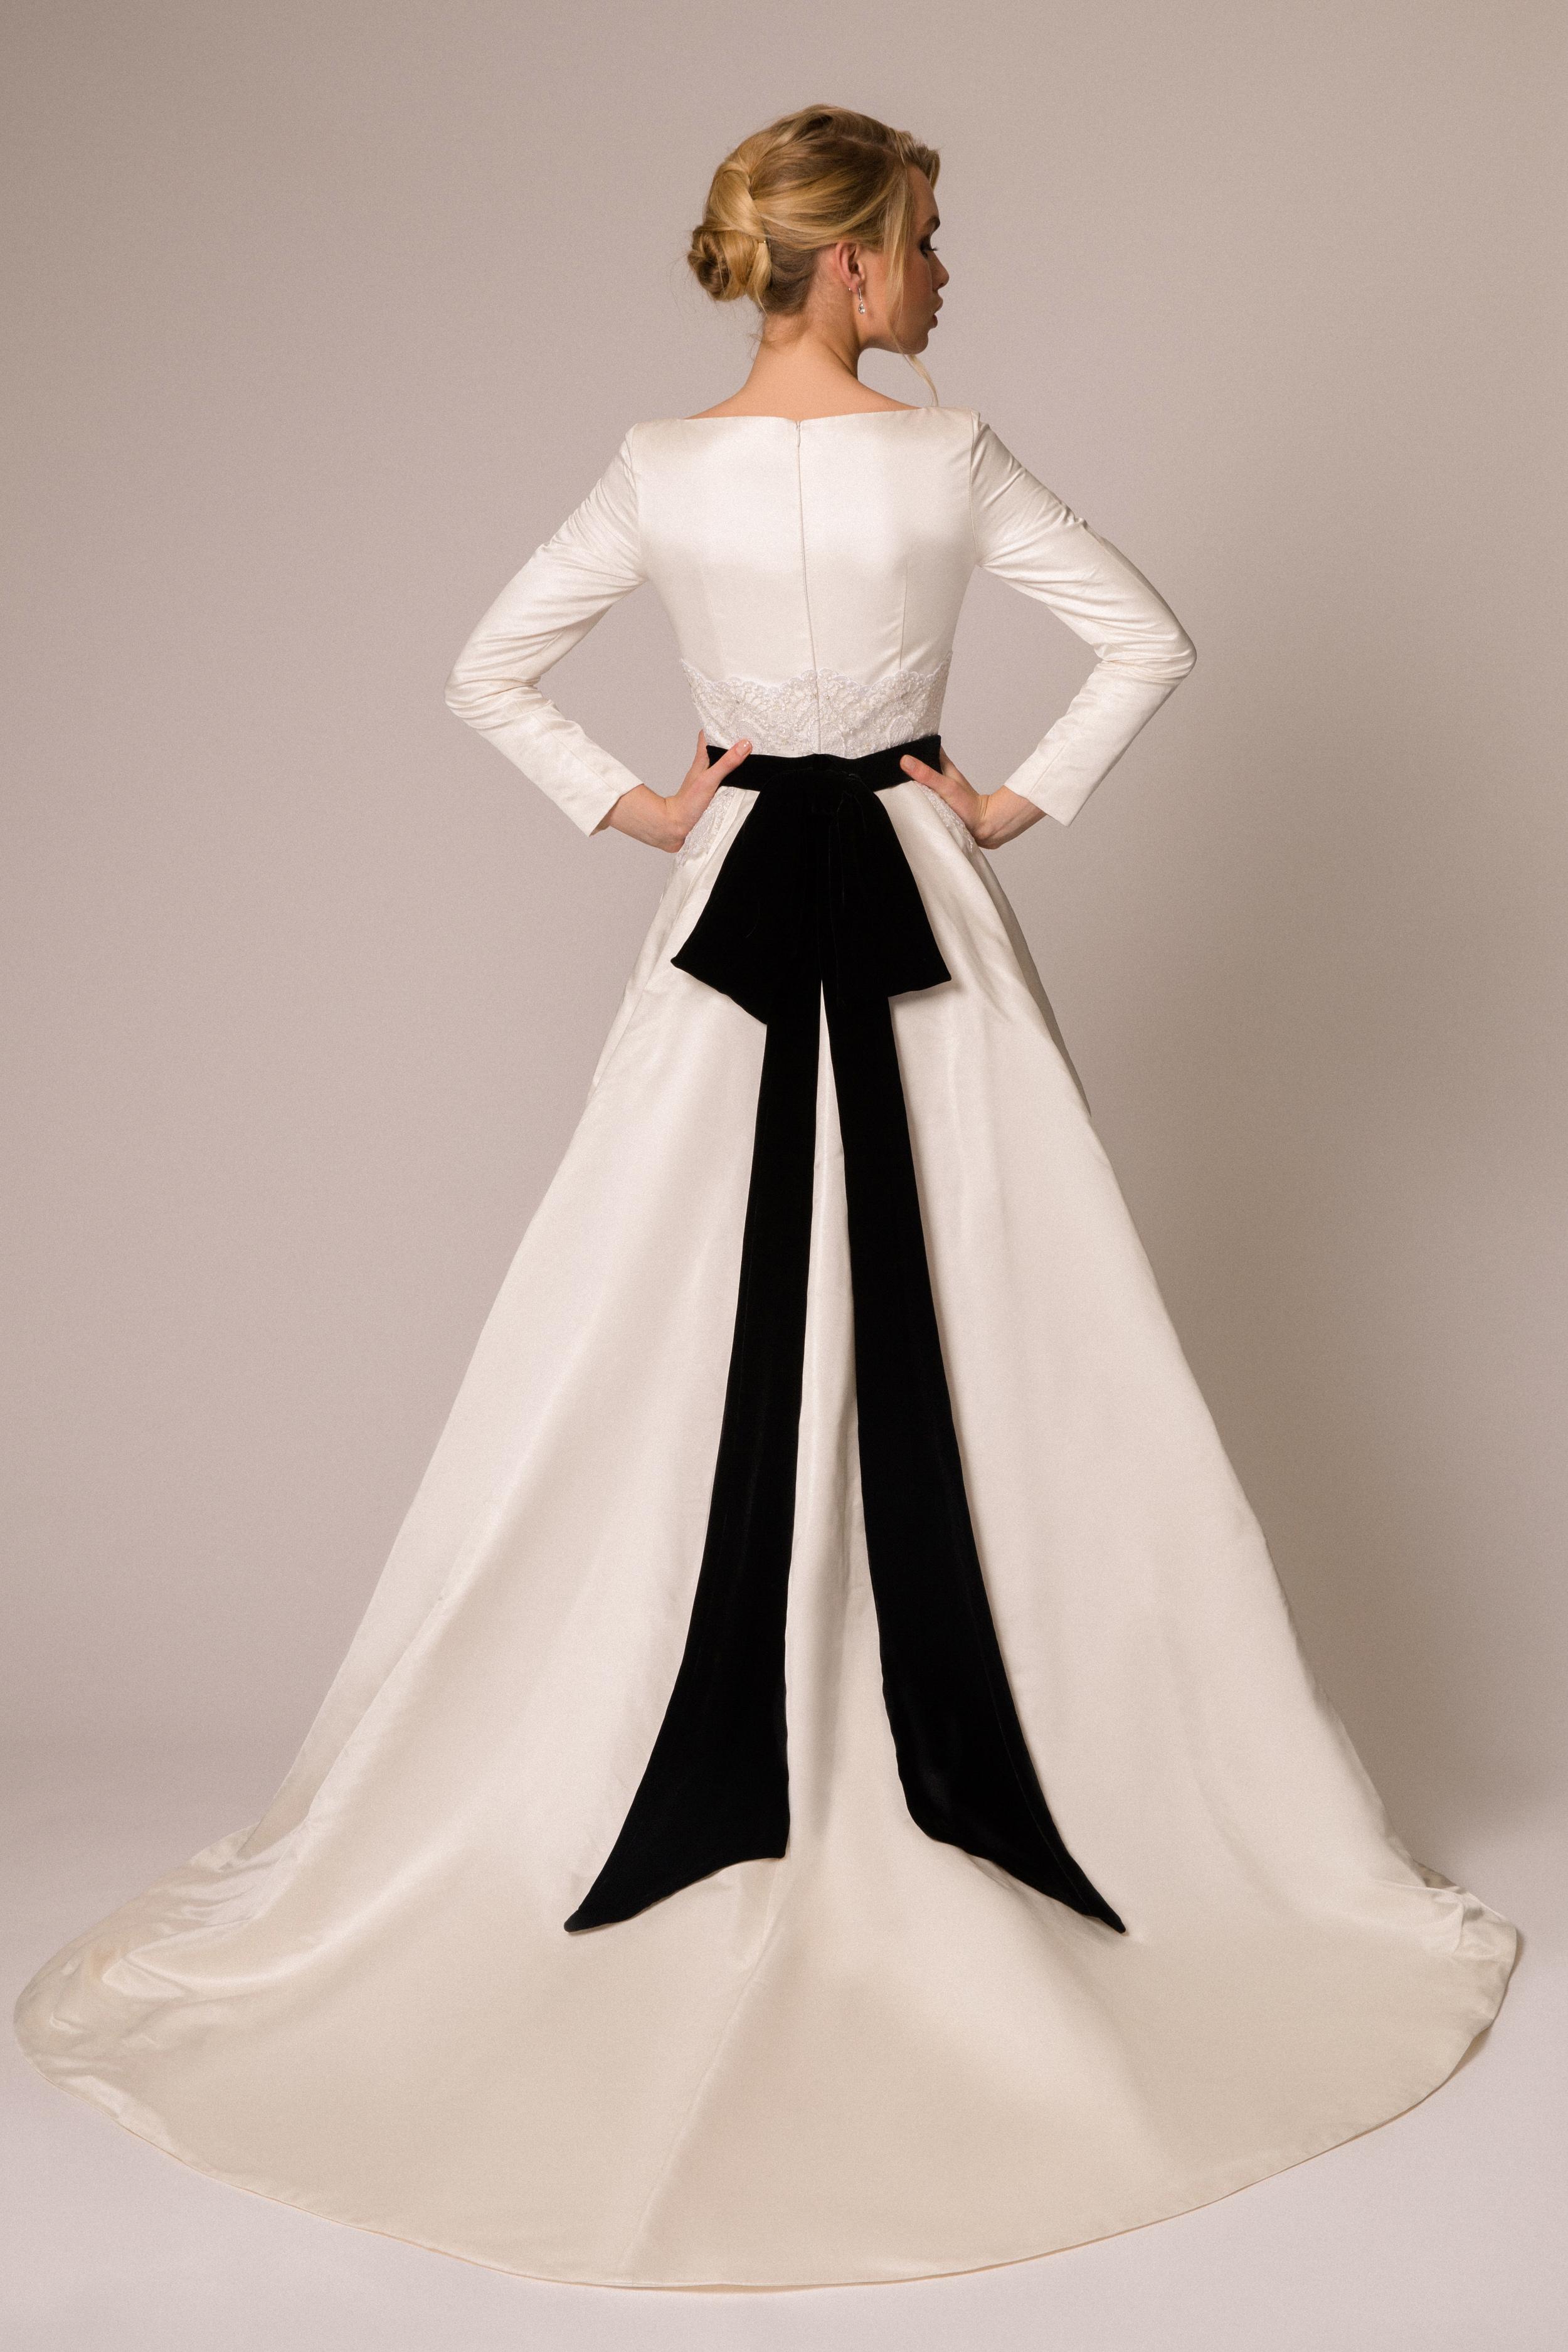 The Hera Dress